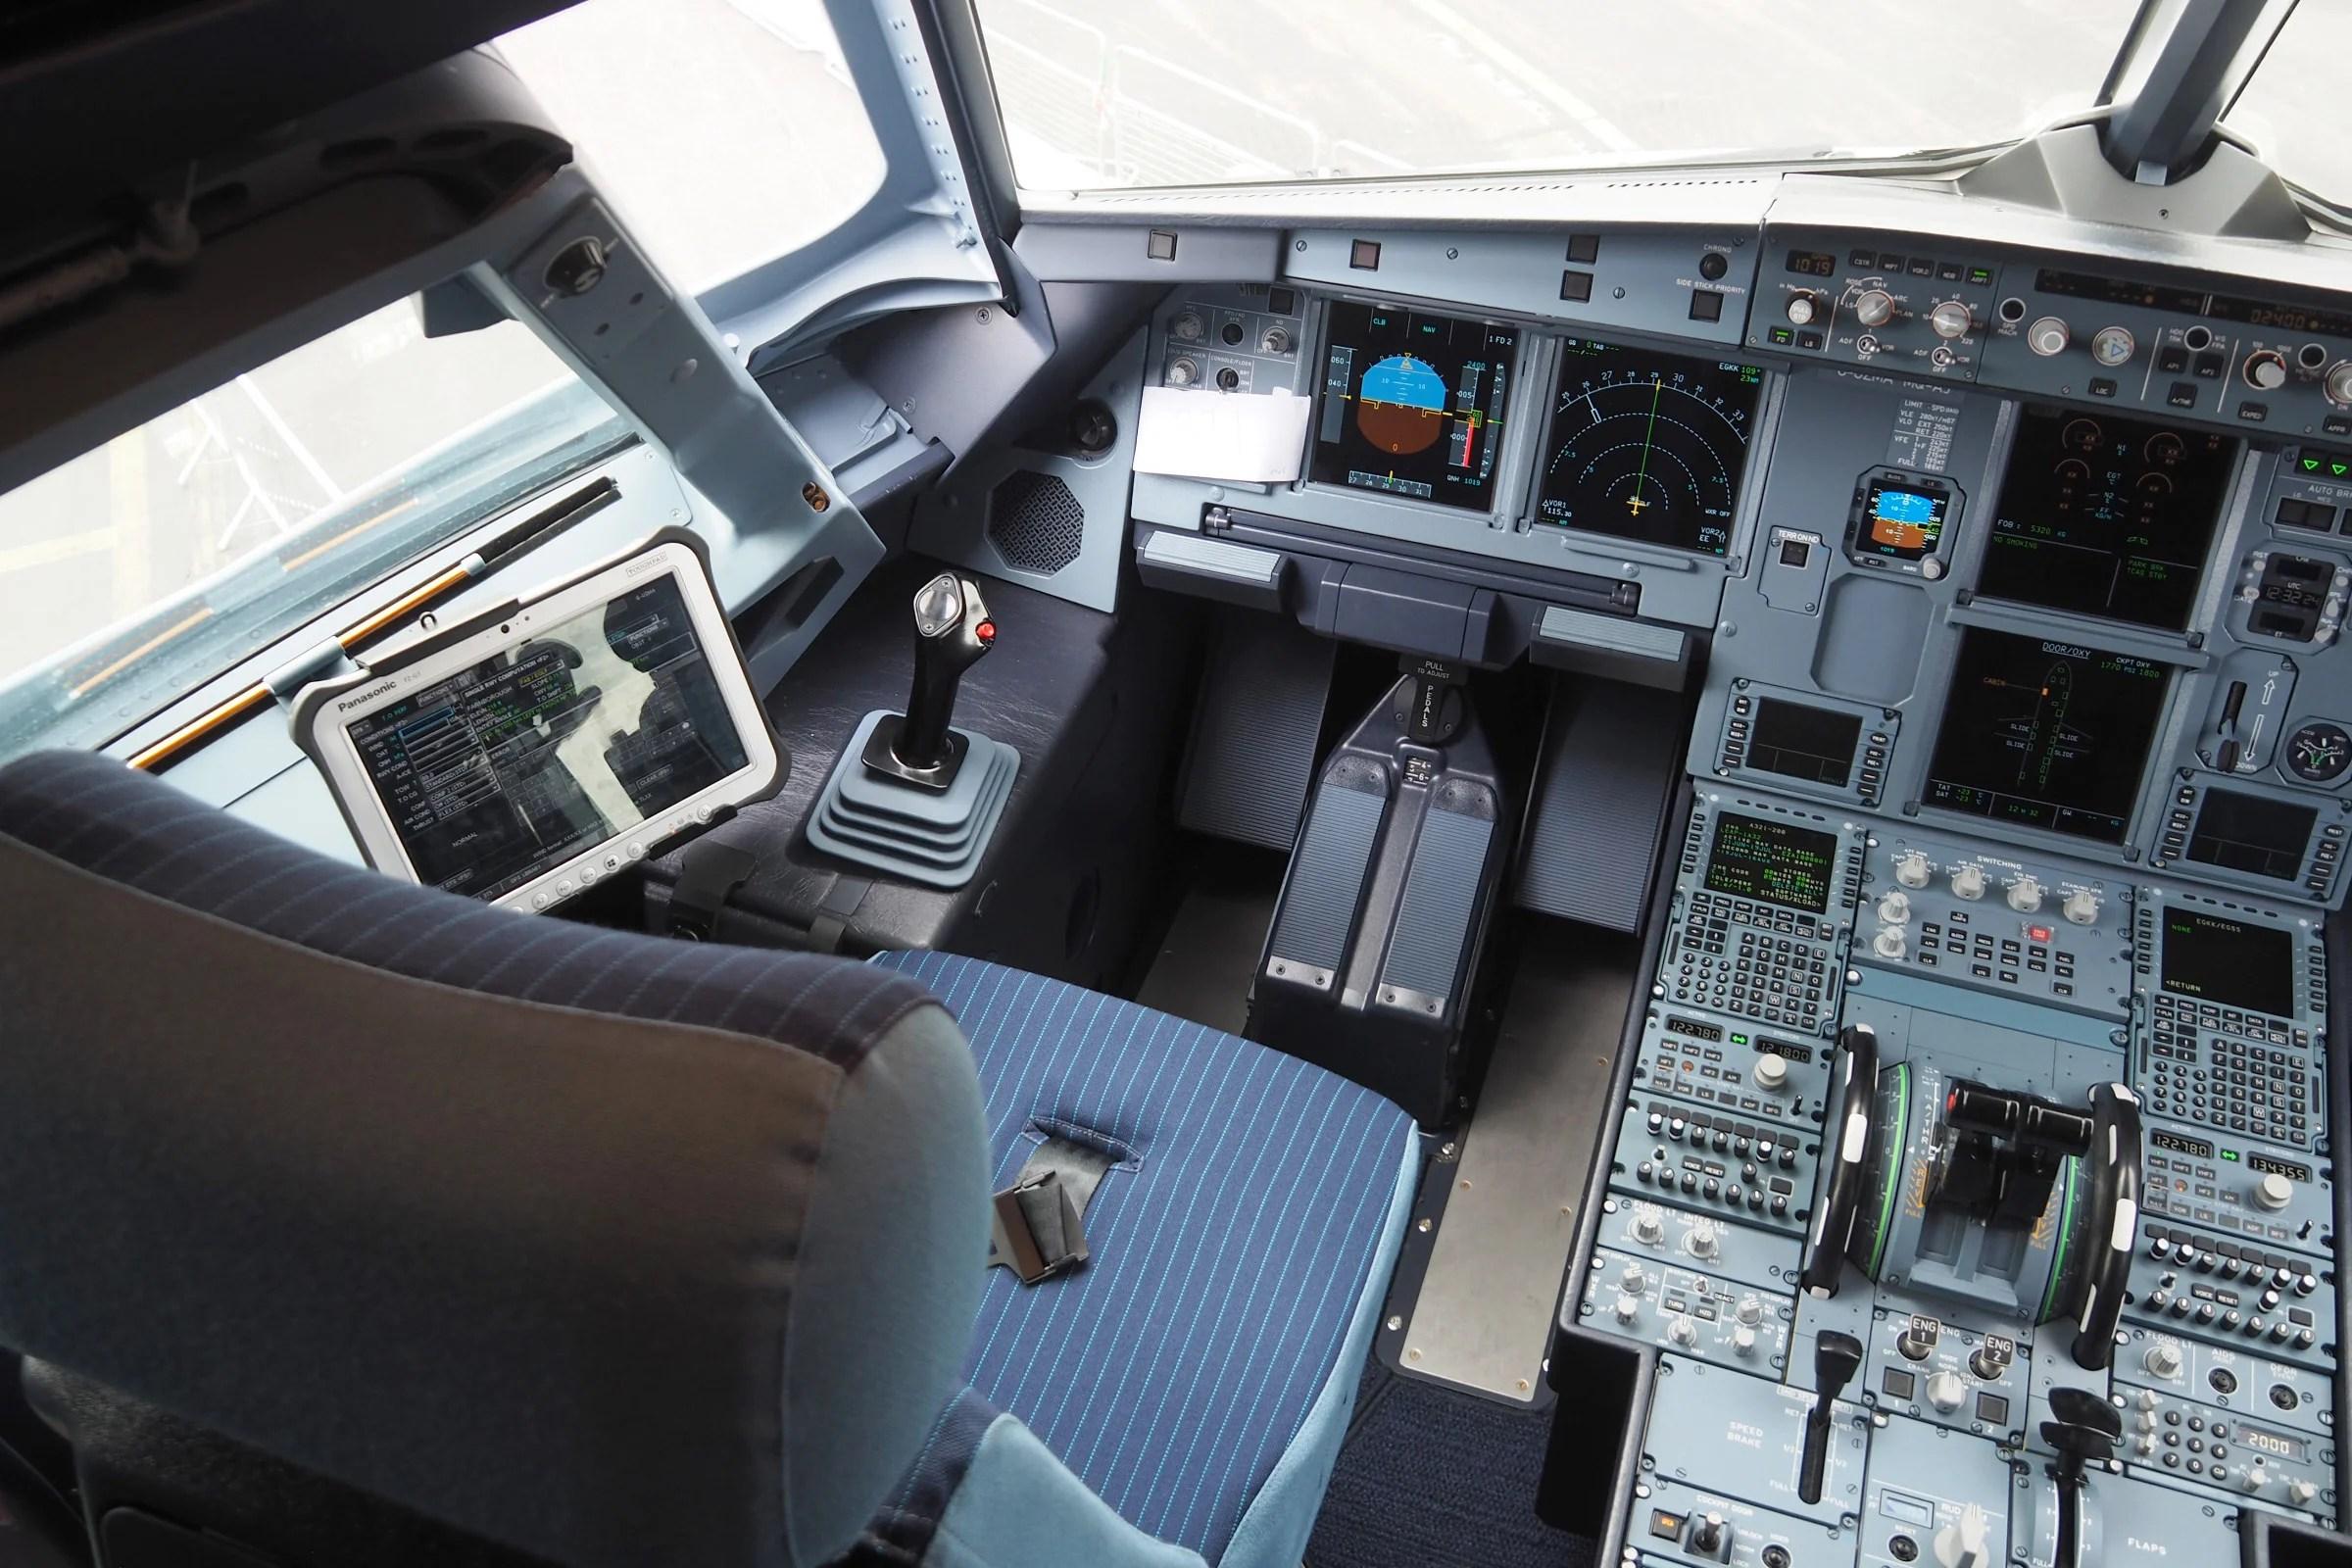 Passenger flies EasyJet plane after pilot goes missing